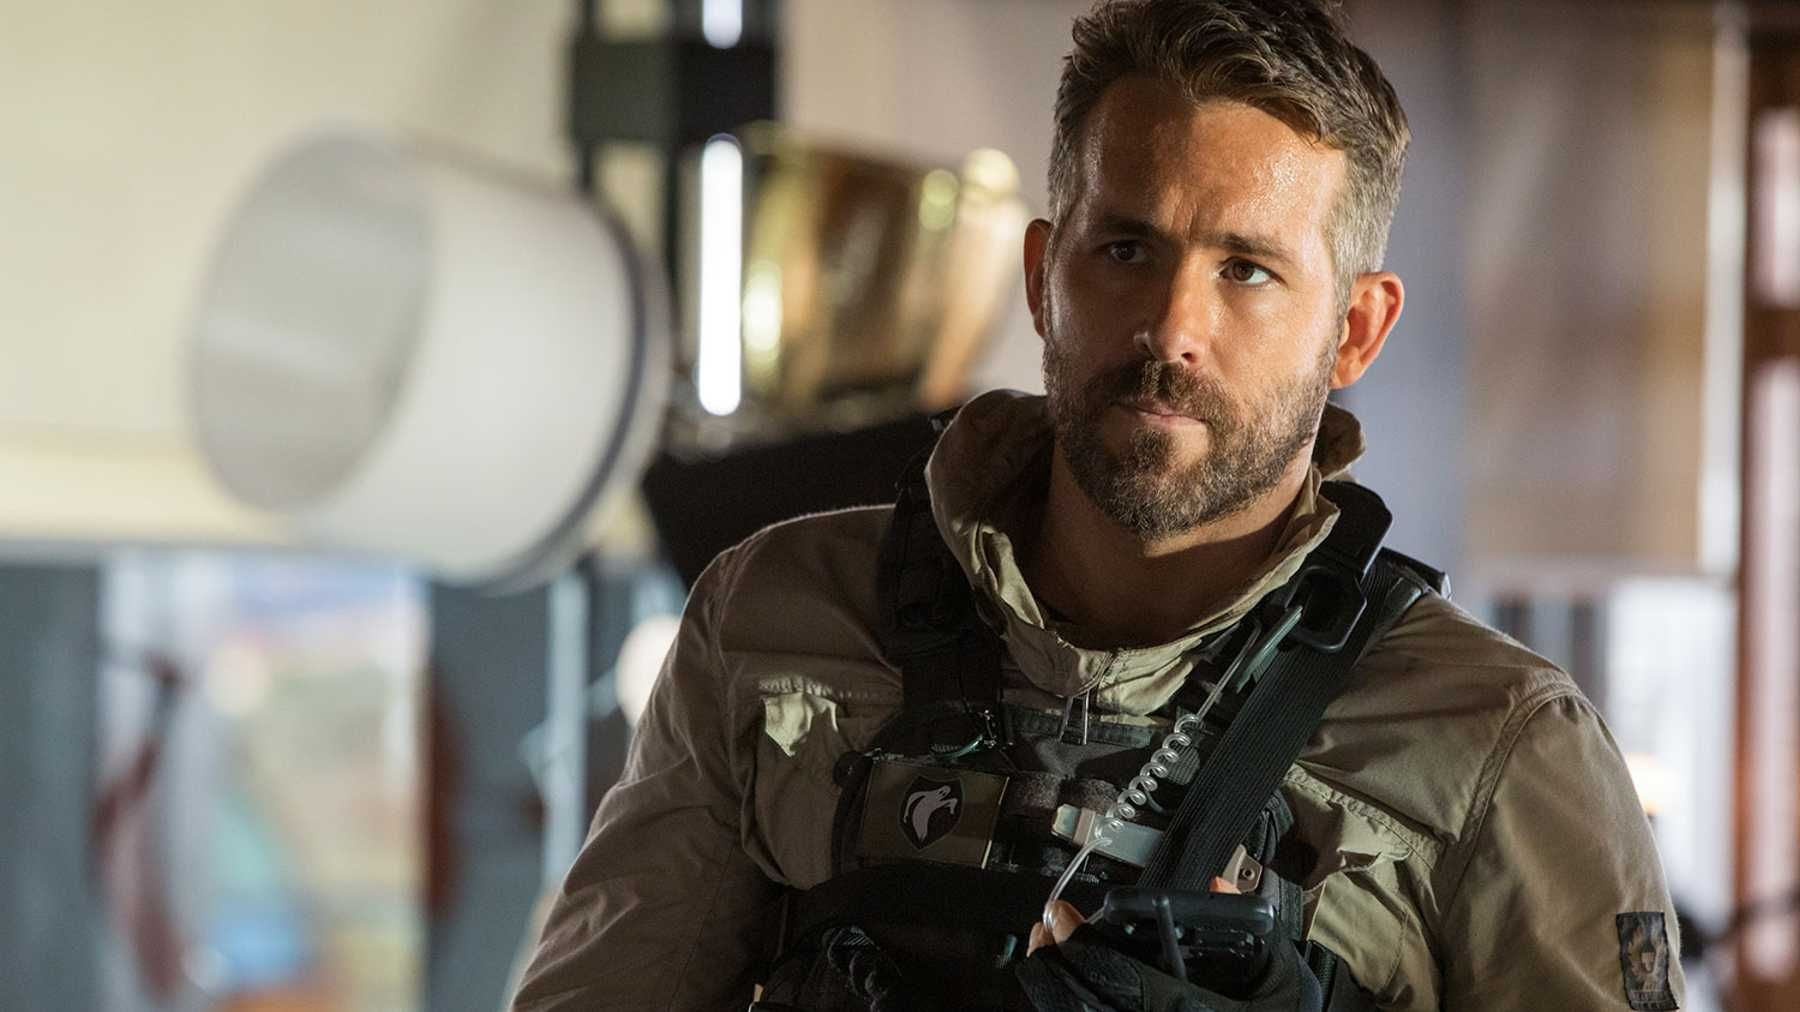 Ryan Reynolds' New Movie 6 Underground Includes a Pretty Great Goof